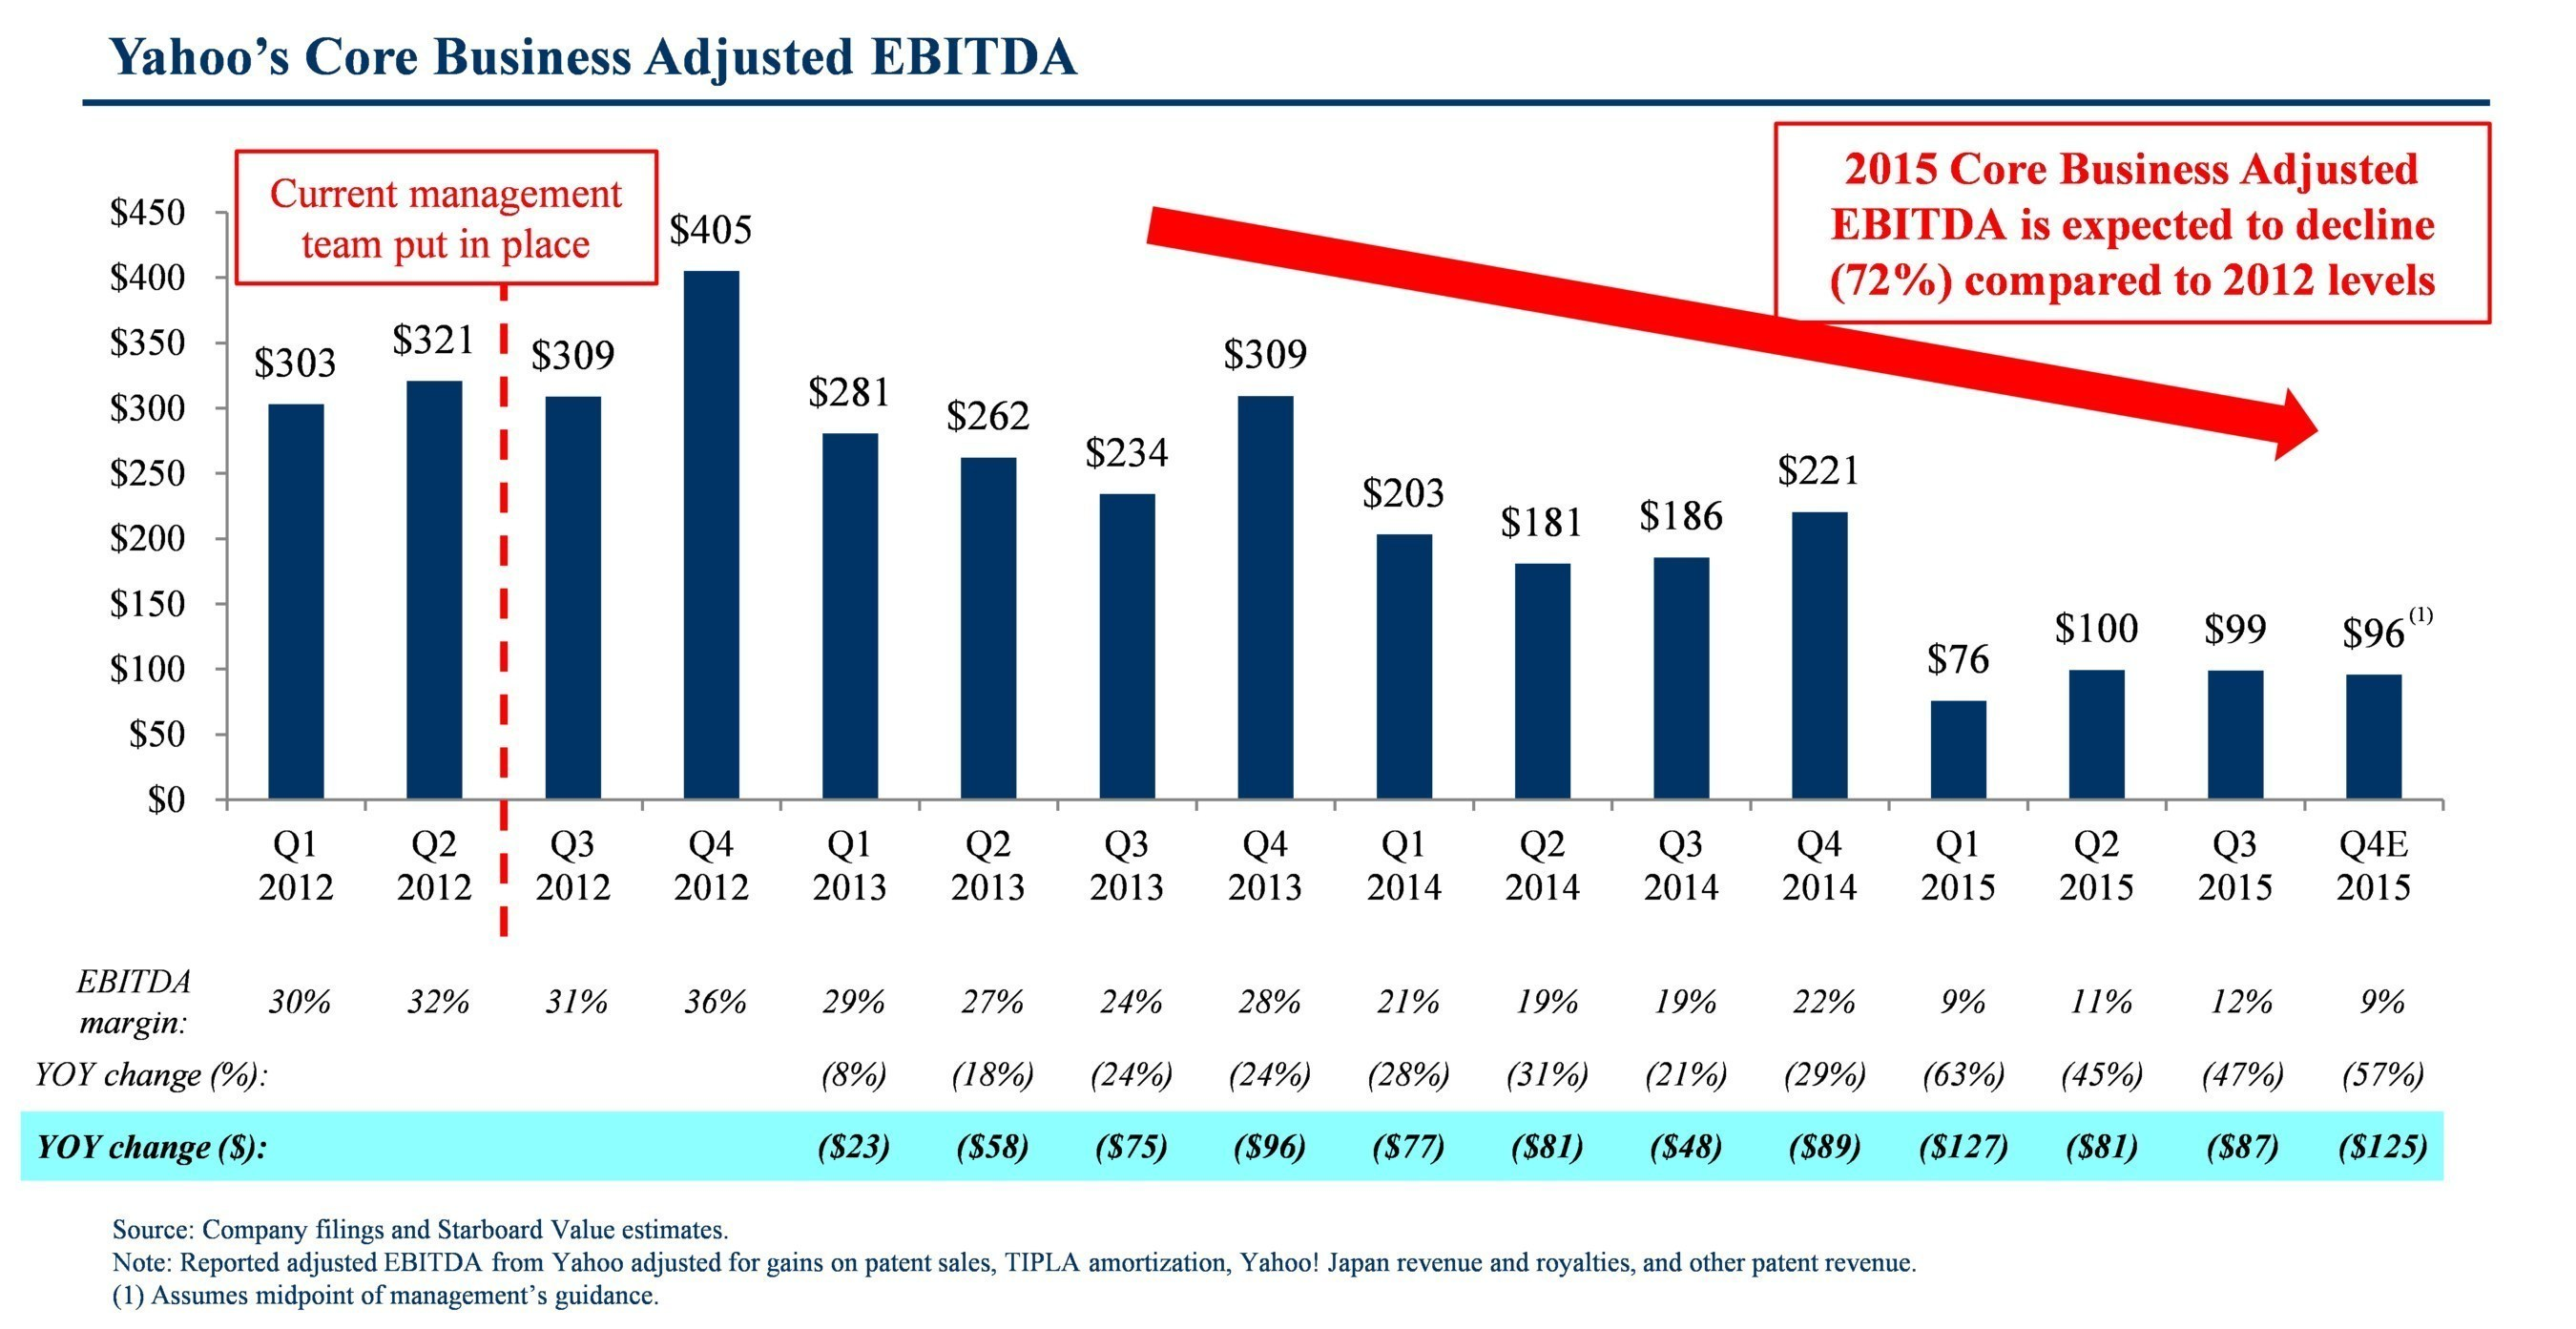 Yahoo's Core Business Adjusted EBITDA